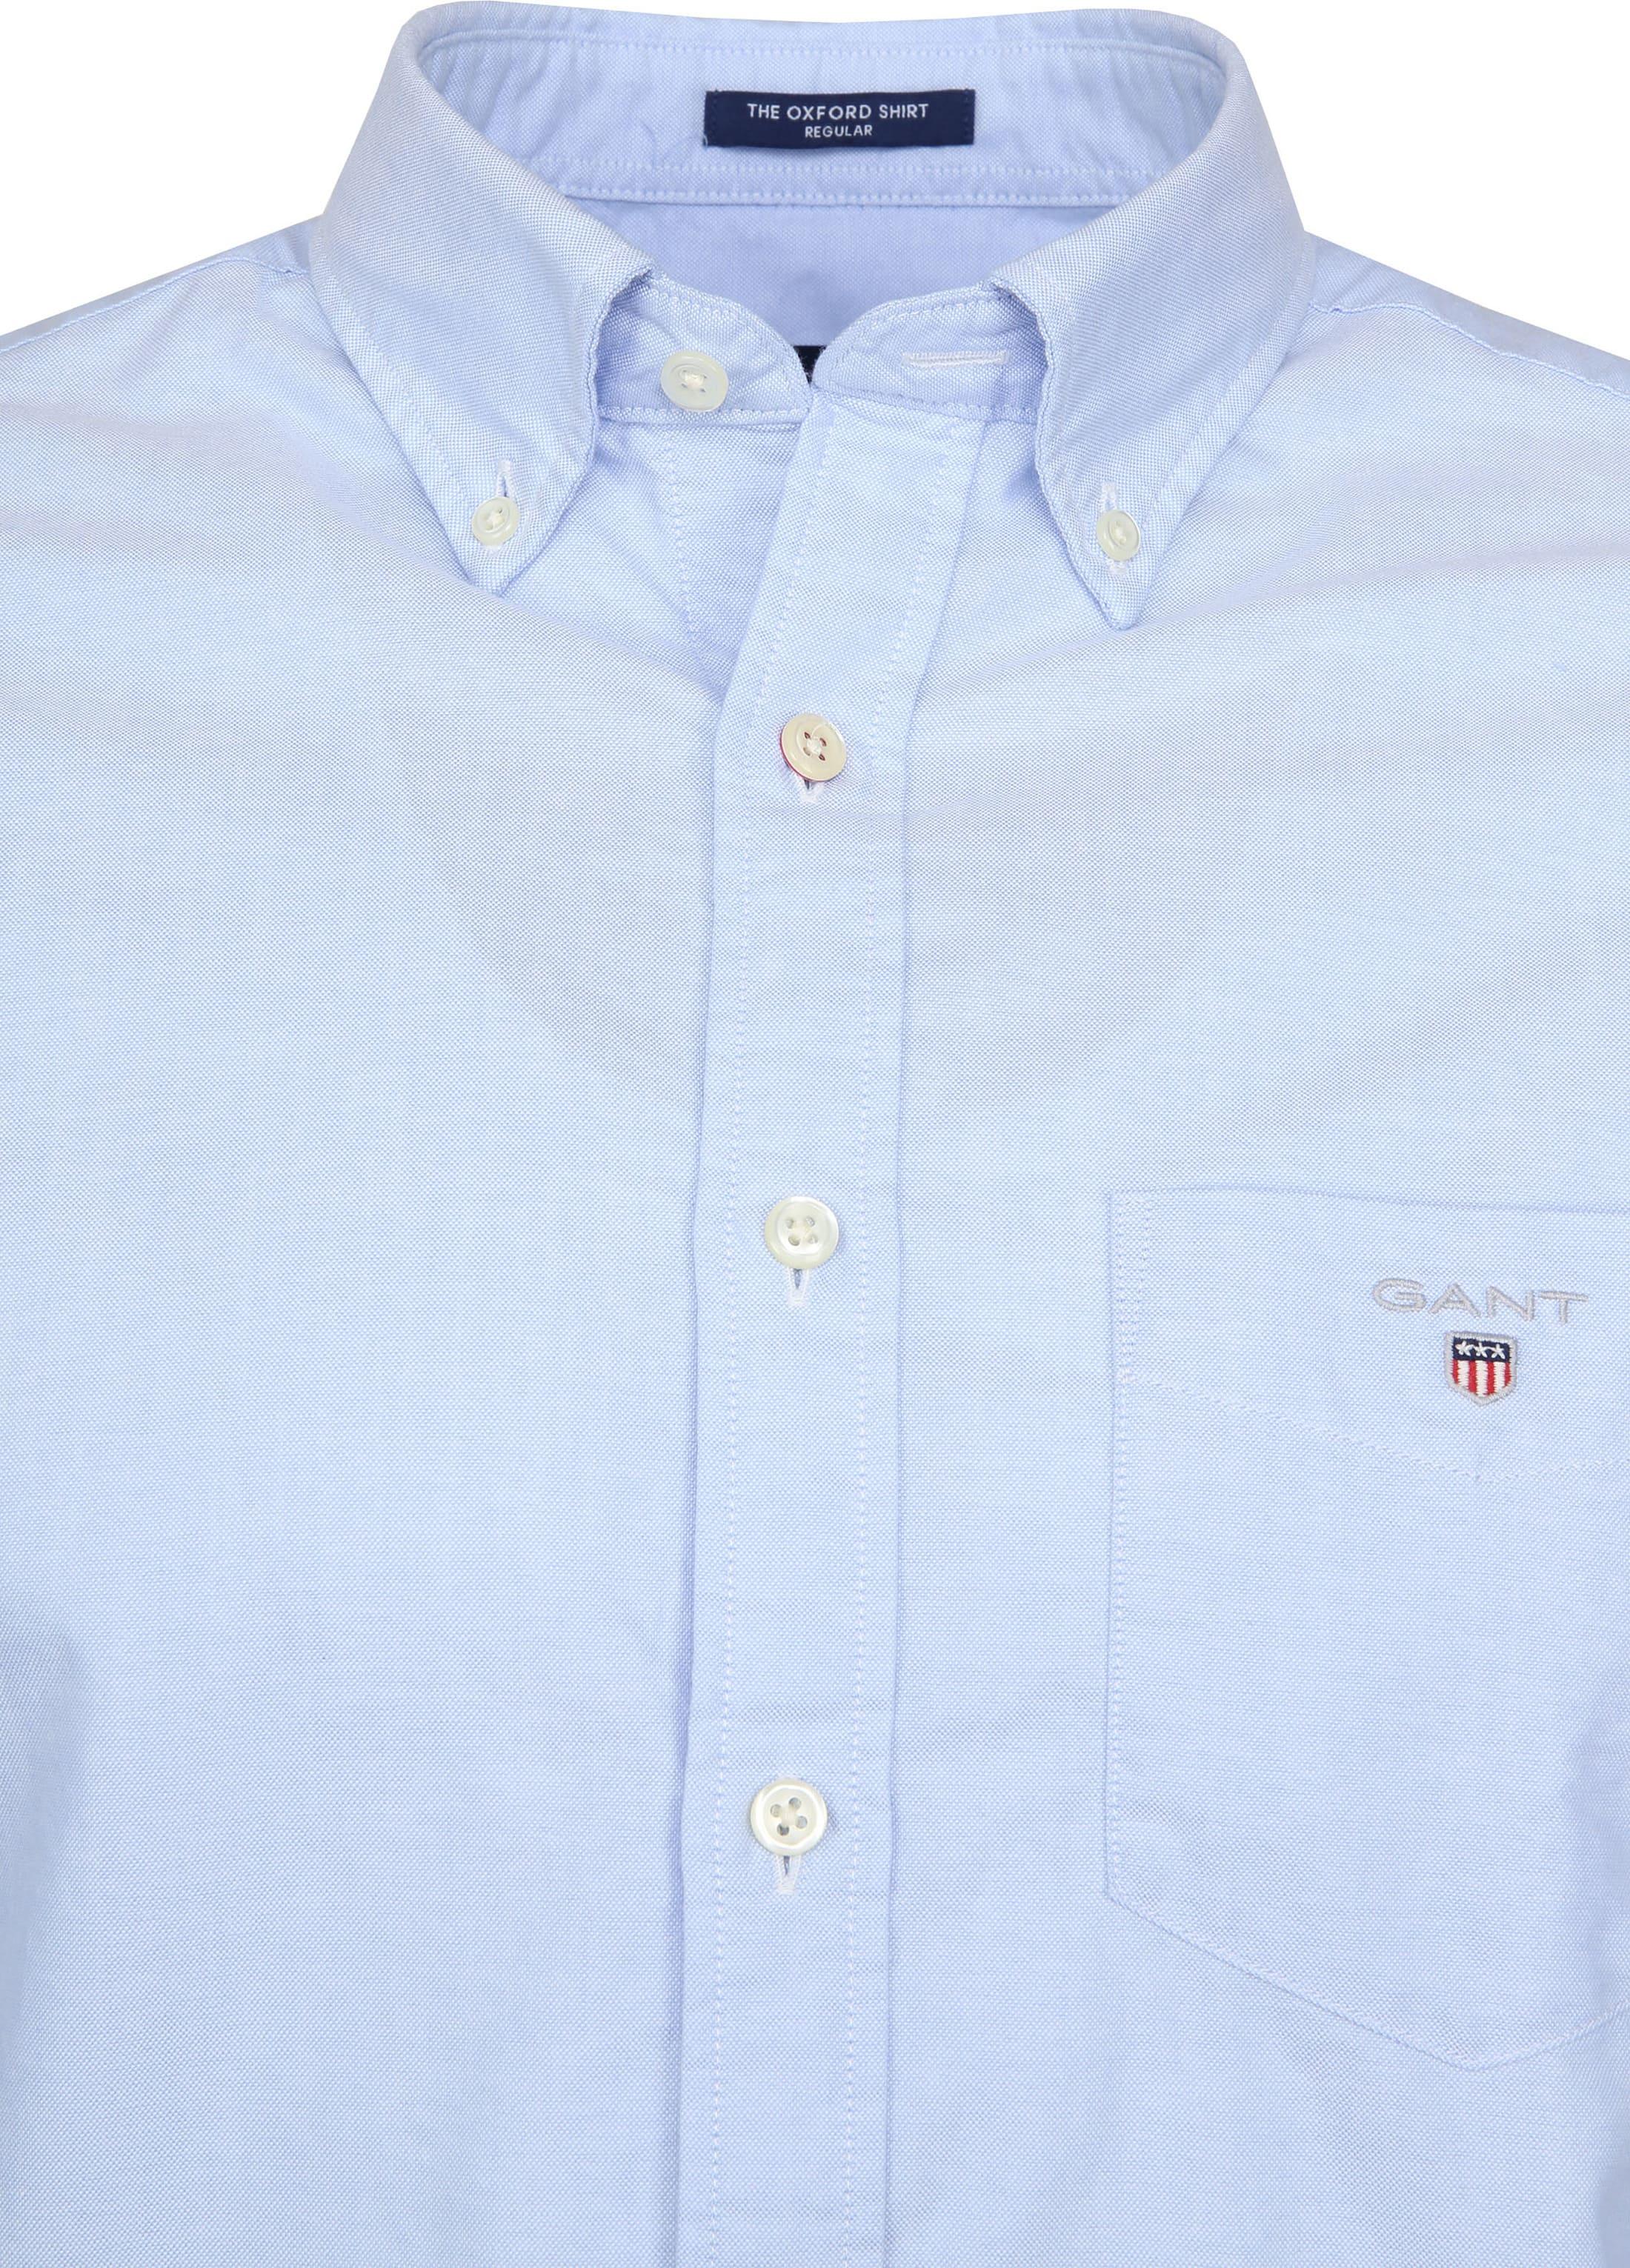 Gant Casual Overhemd Oxford Lichtblauw foto 1